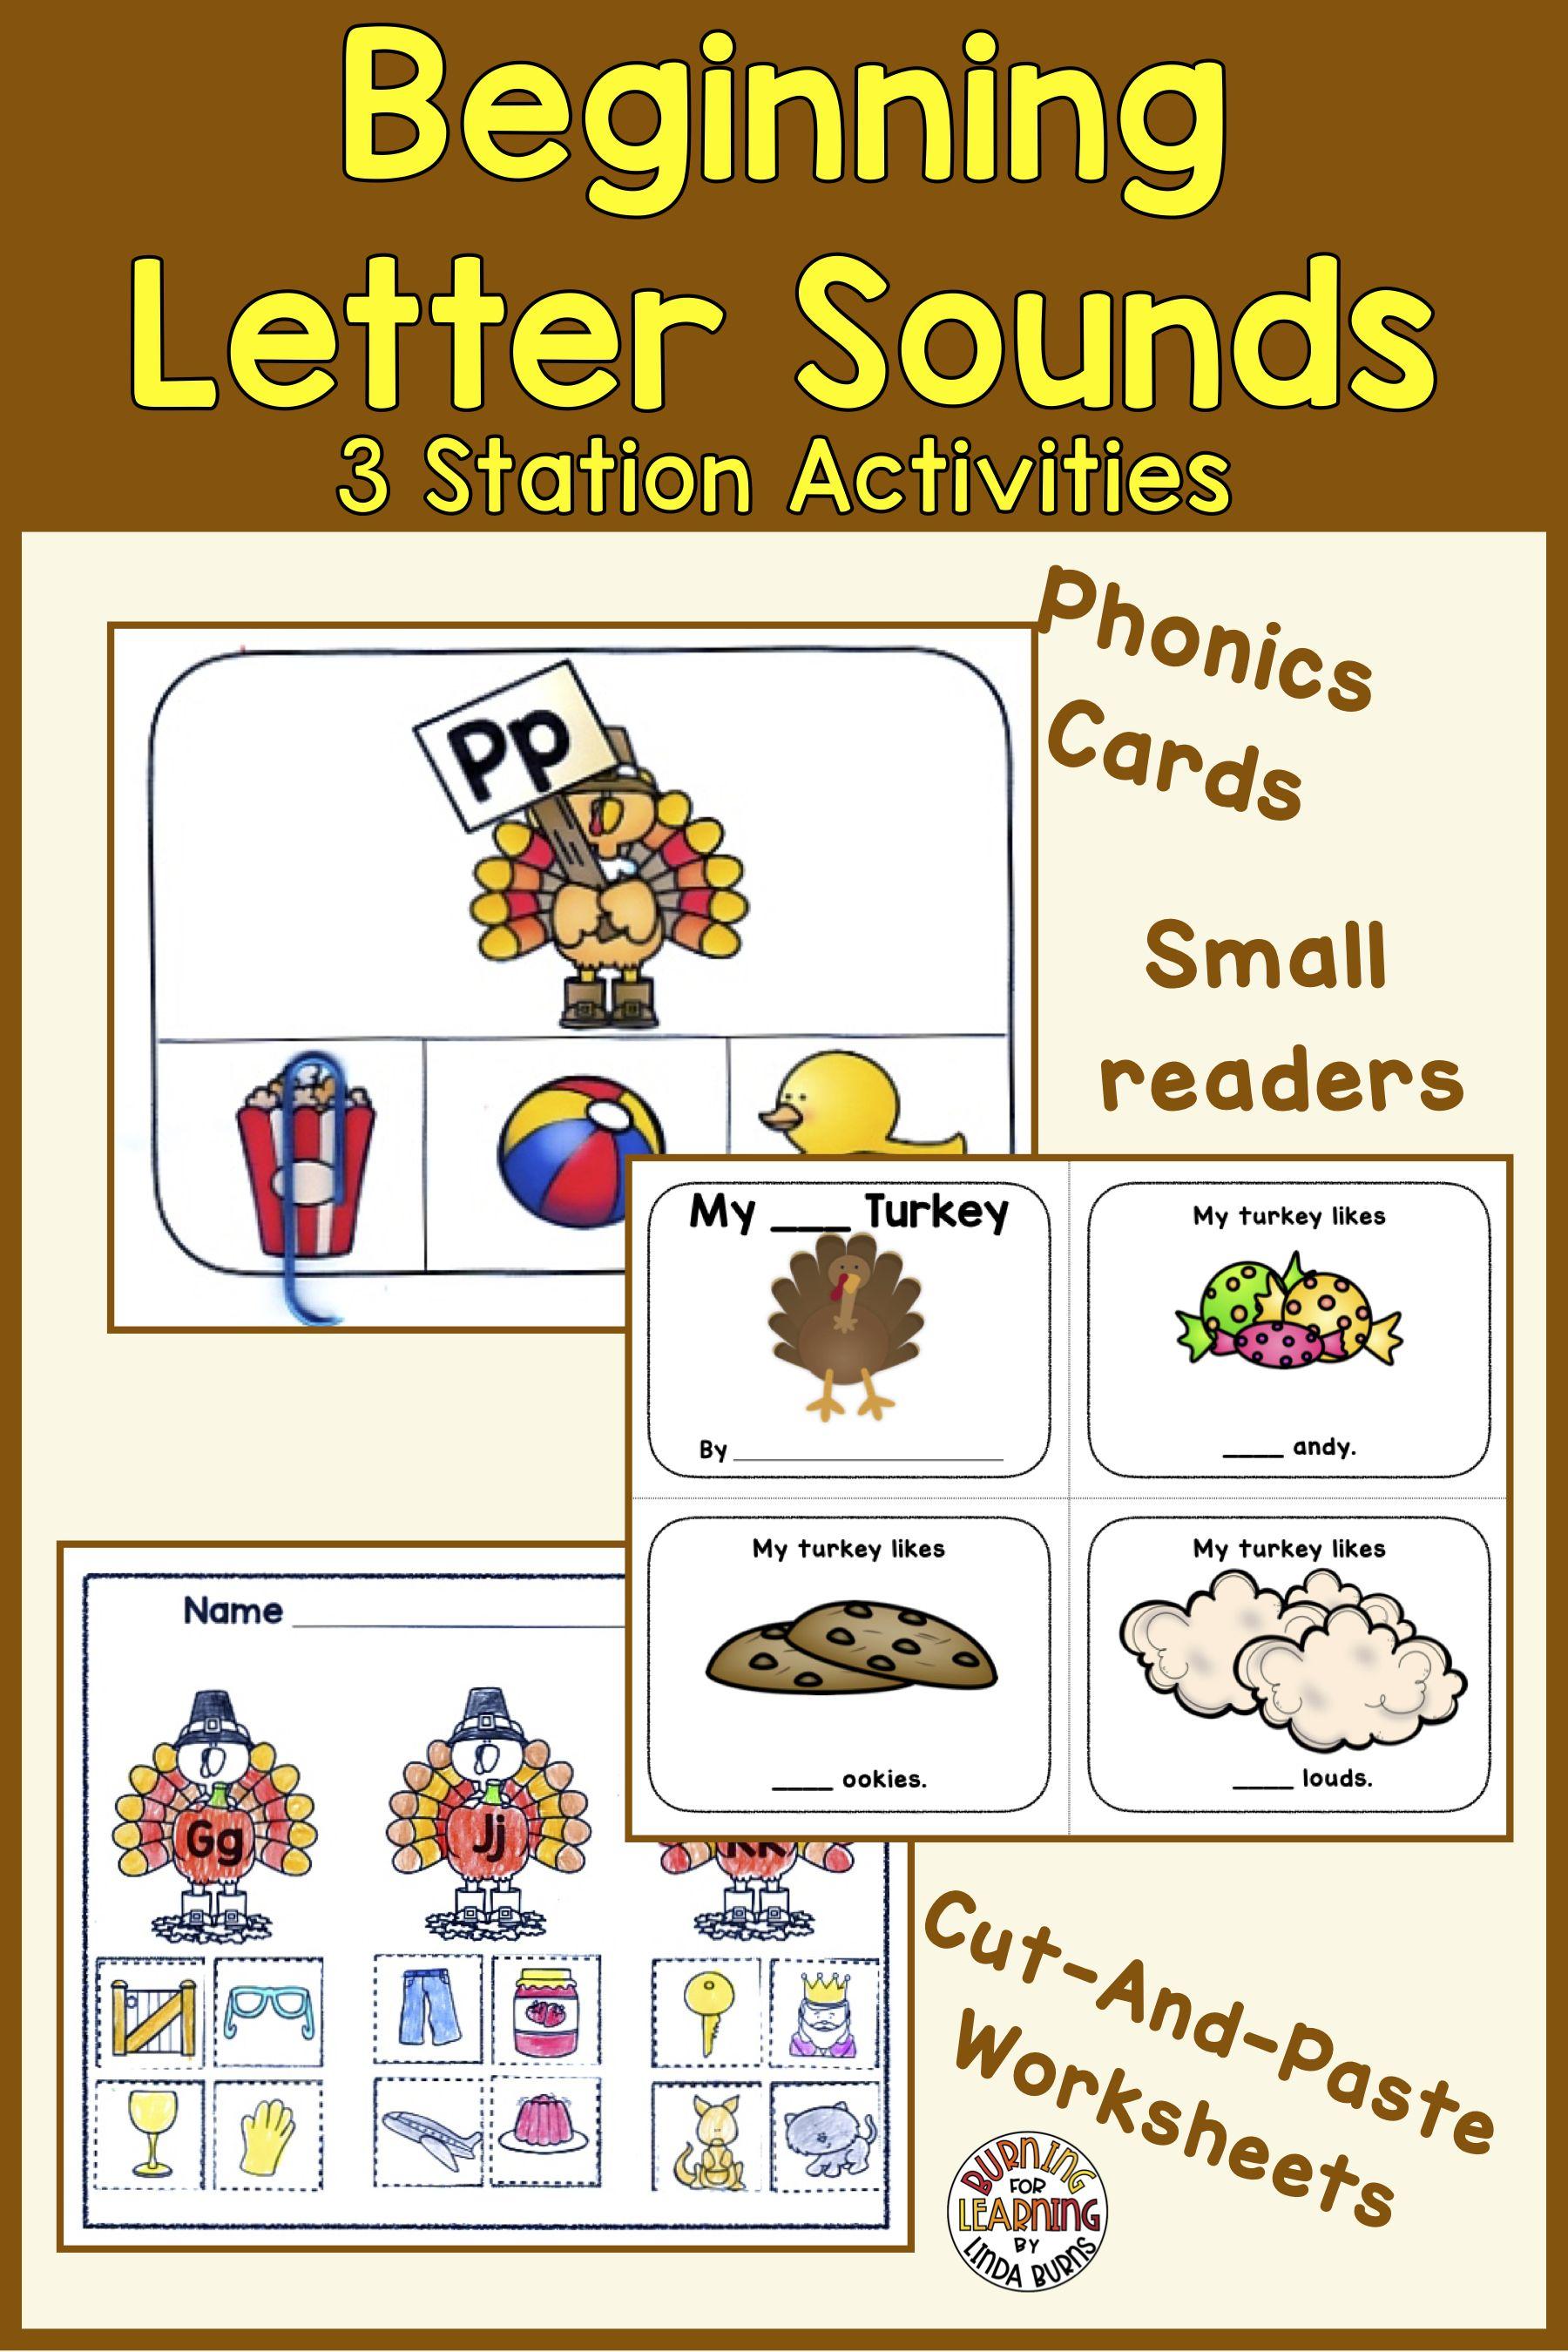 Beginning Letter Sounds Activities